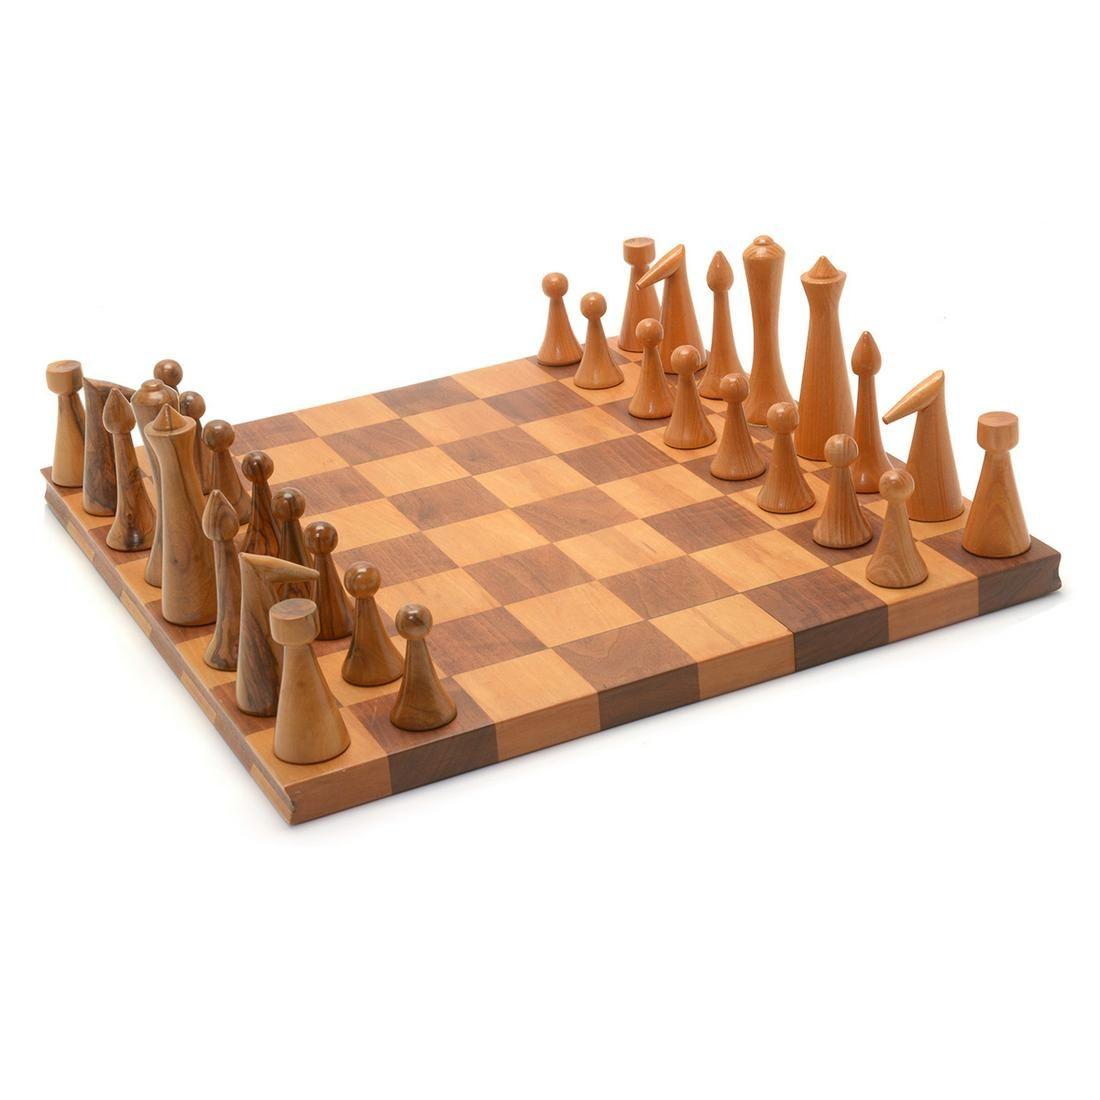 Mid-Century Modern Espenet Chess Set